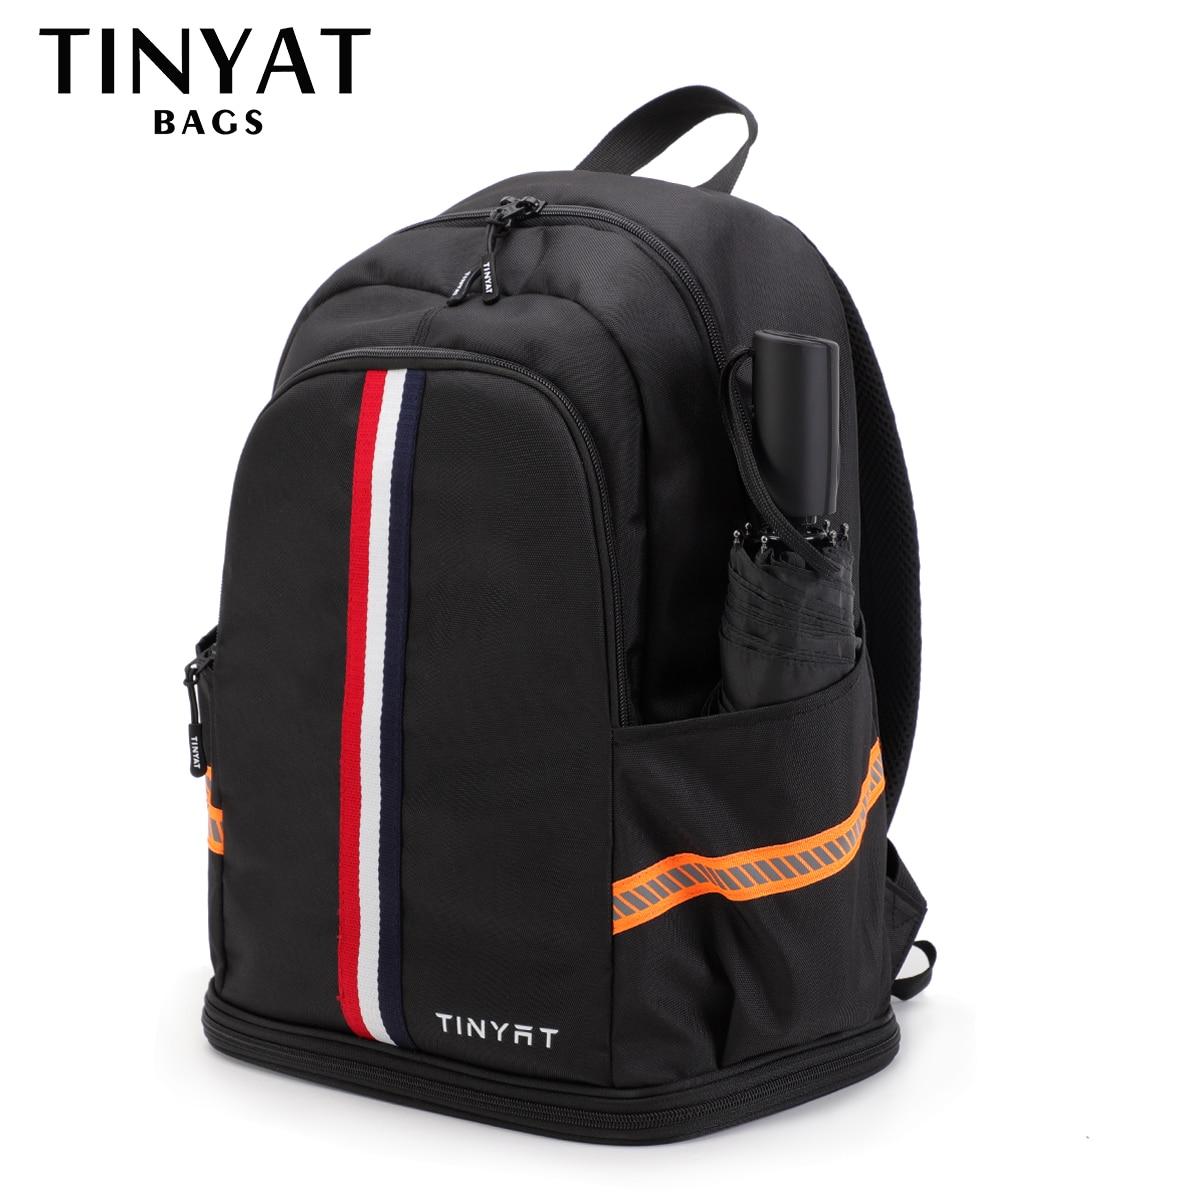 TINYTA Men's backpack Male bag Large Sports Travel backpack Shoes Bag Folded Fitness Backpack School